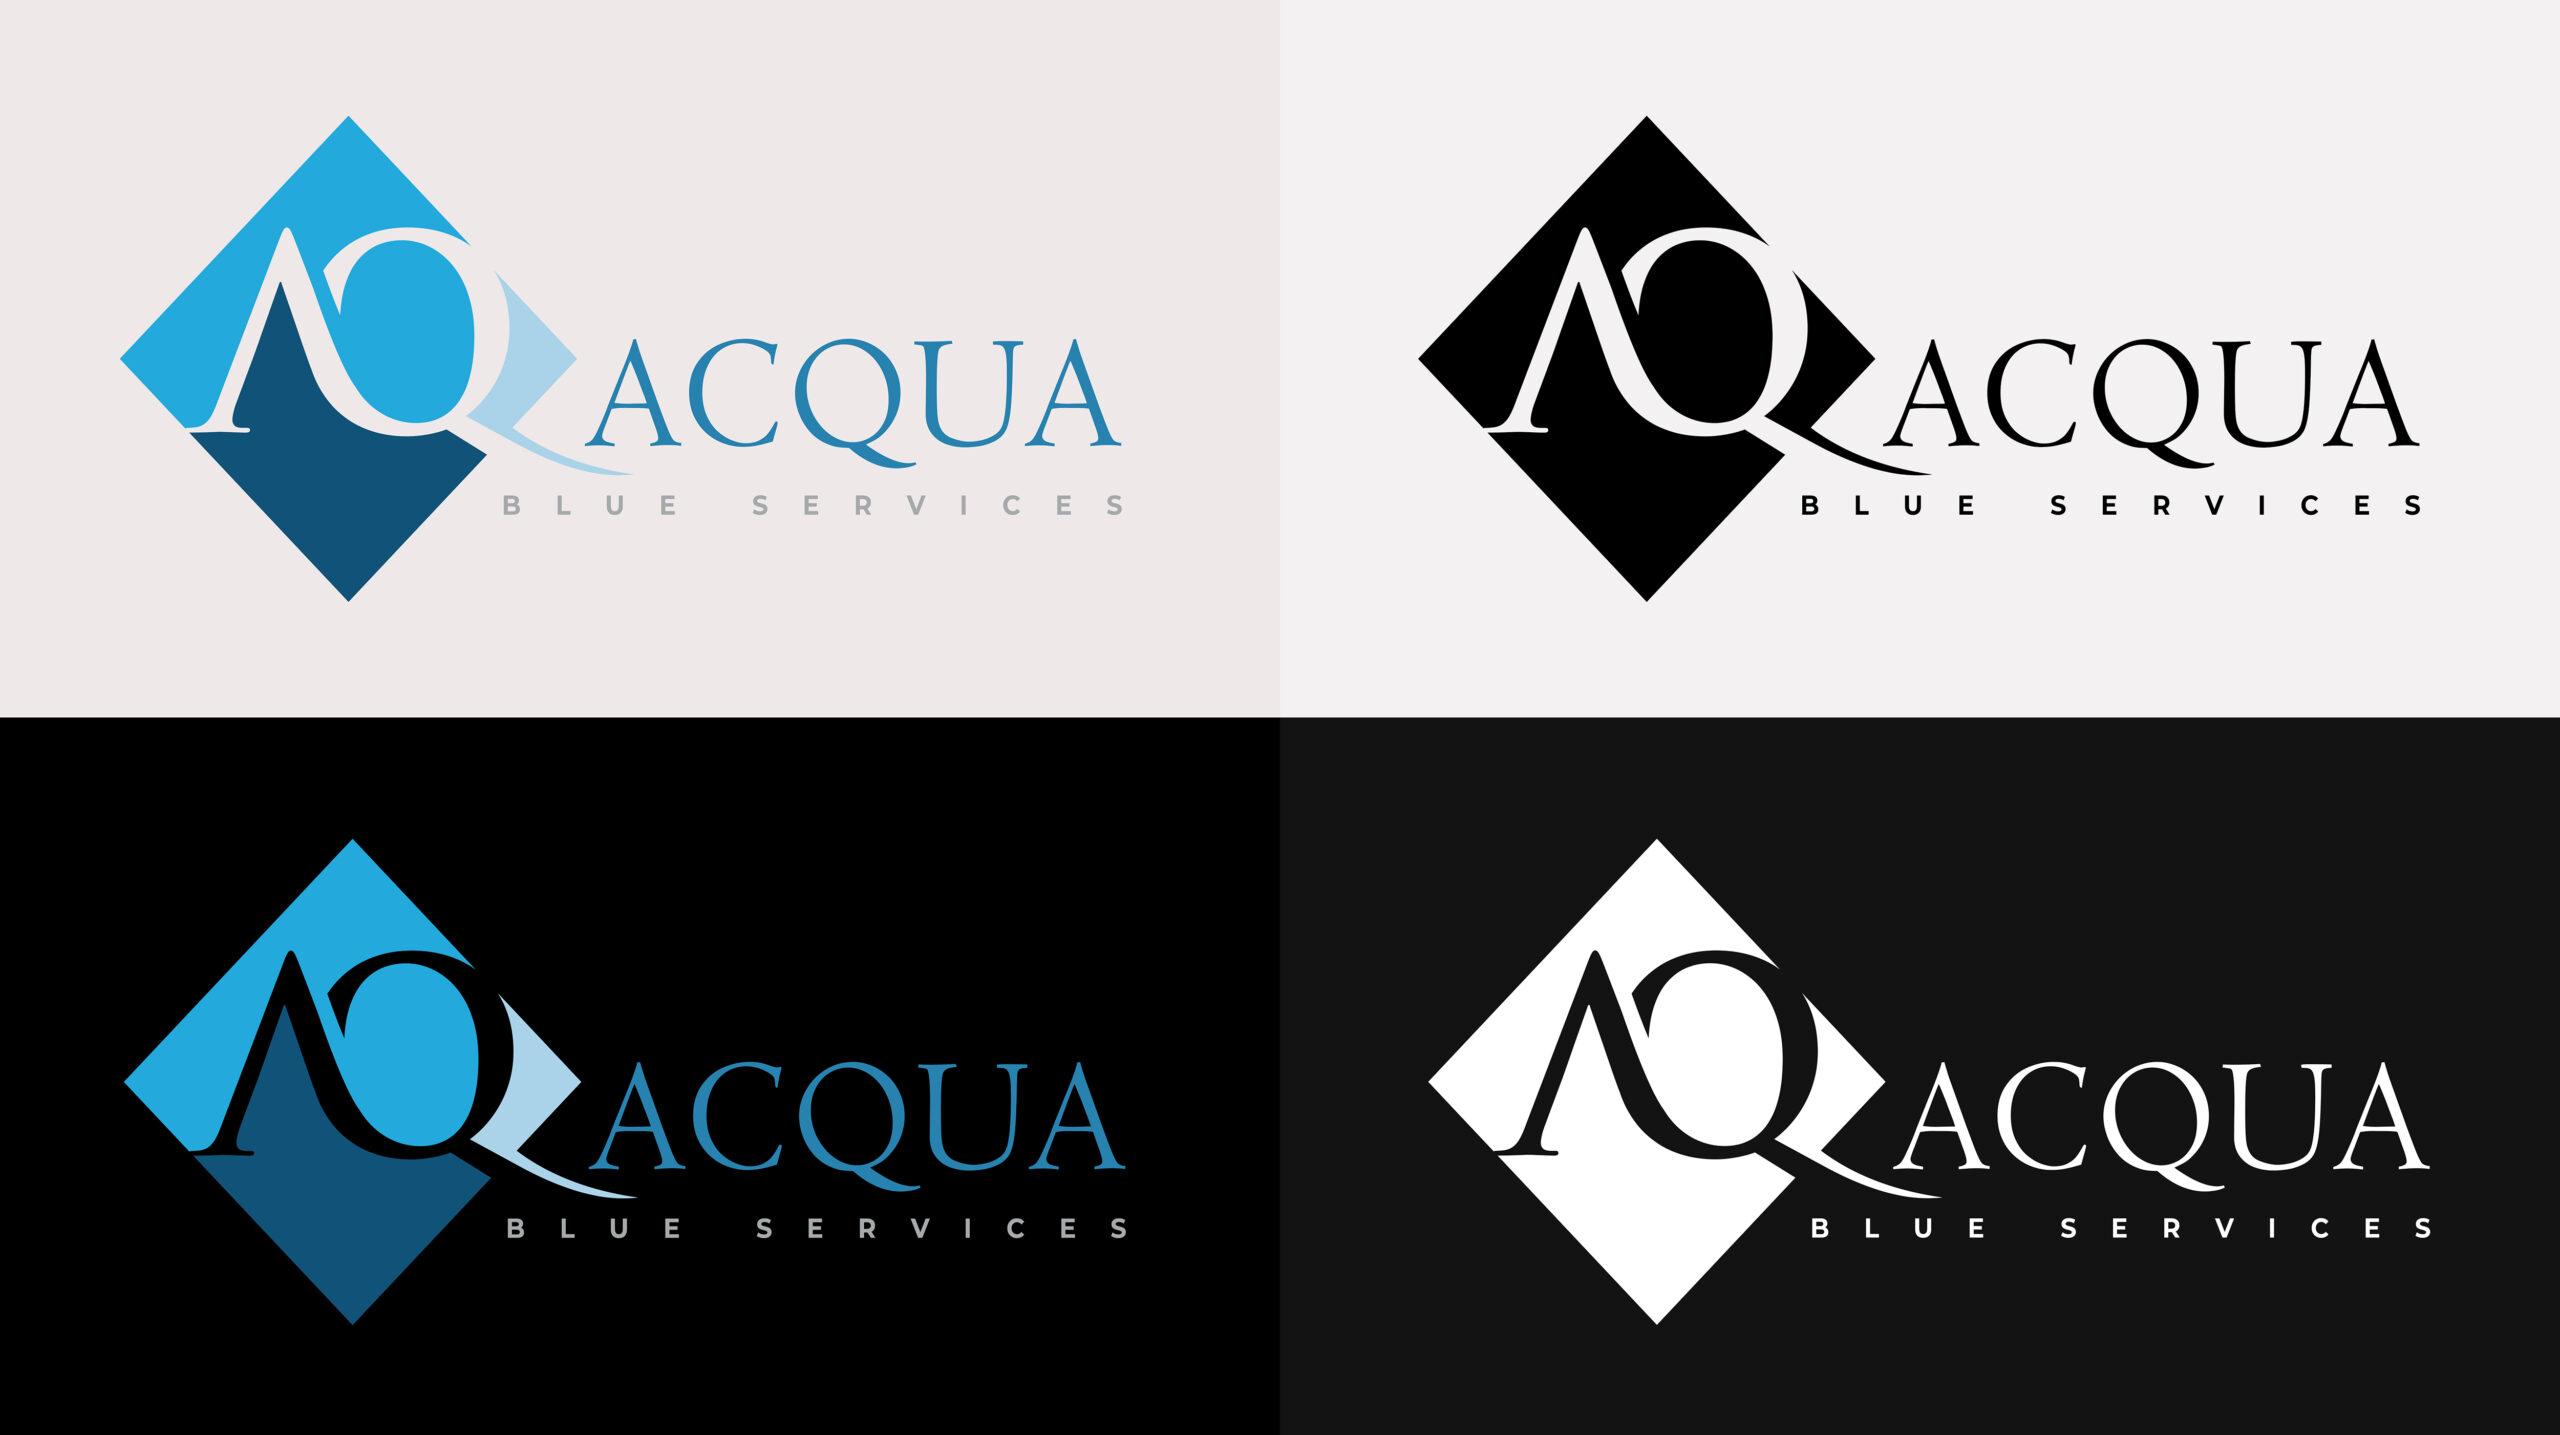 acqua-blue-services-logo-variants